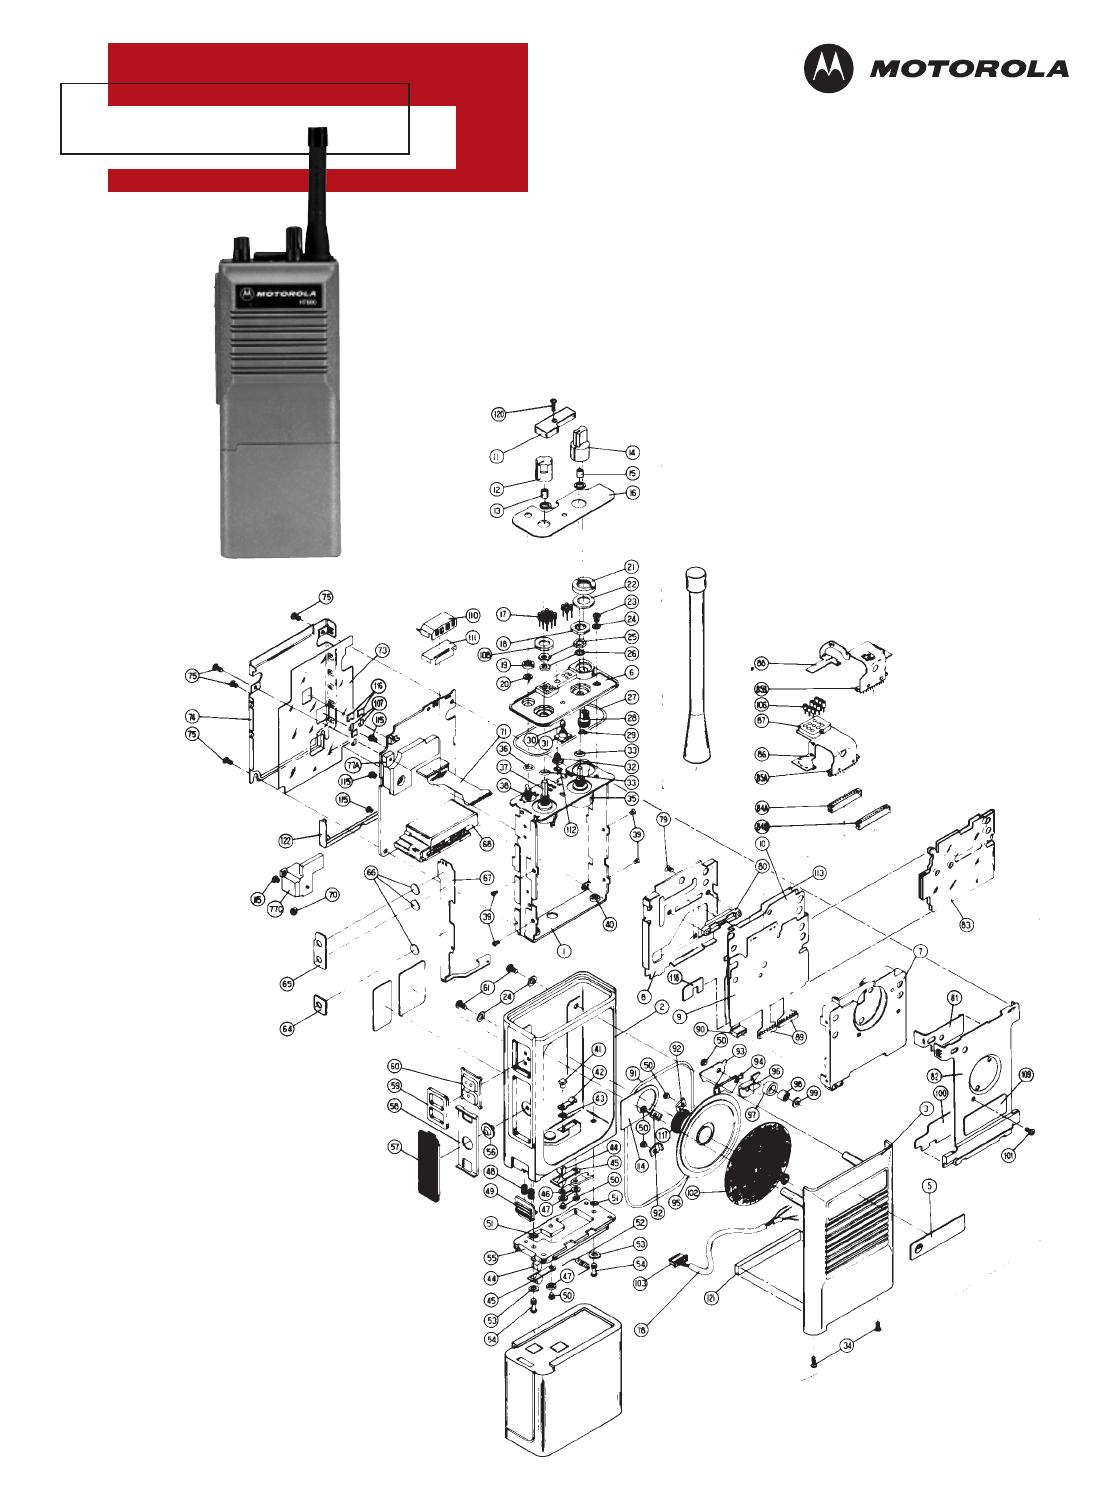 motorola cb radio wiring diagram 93 chevy truck mic conceptdraw office 2